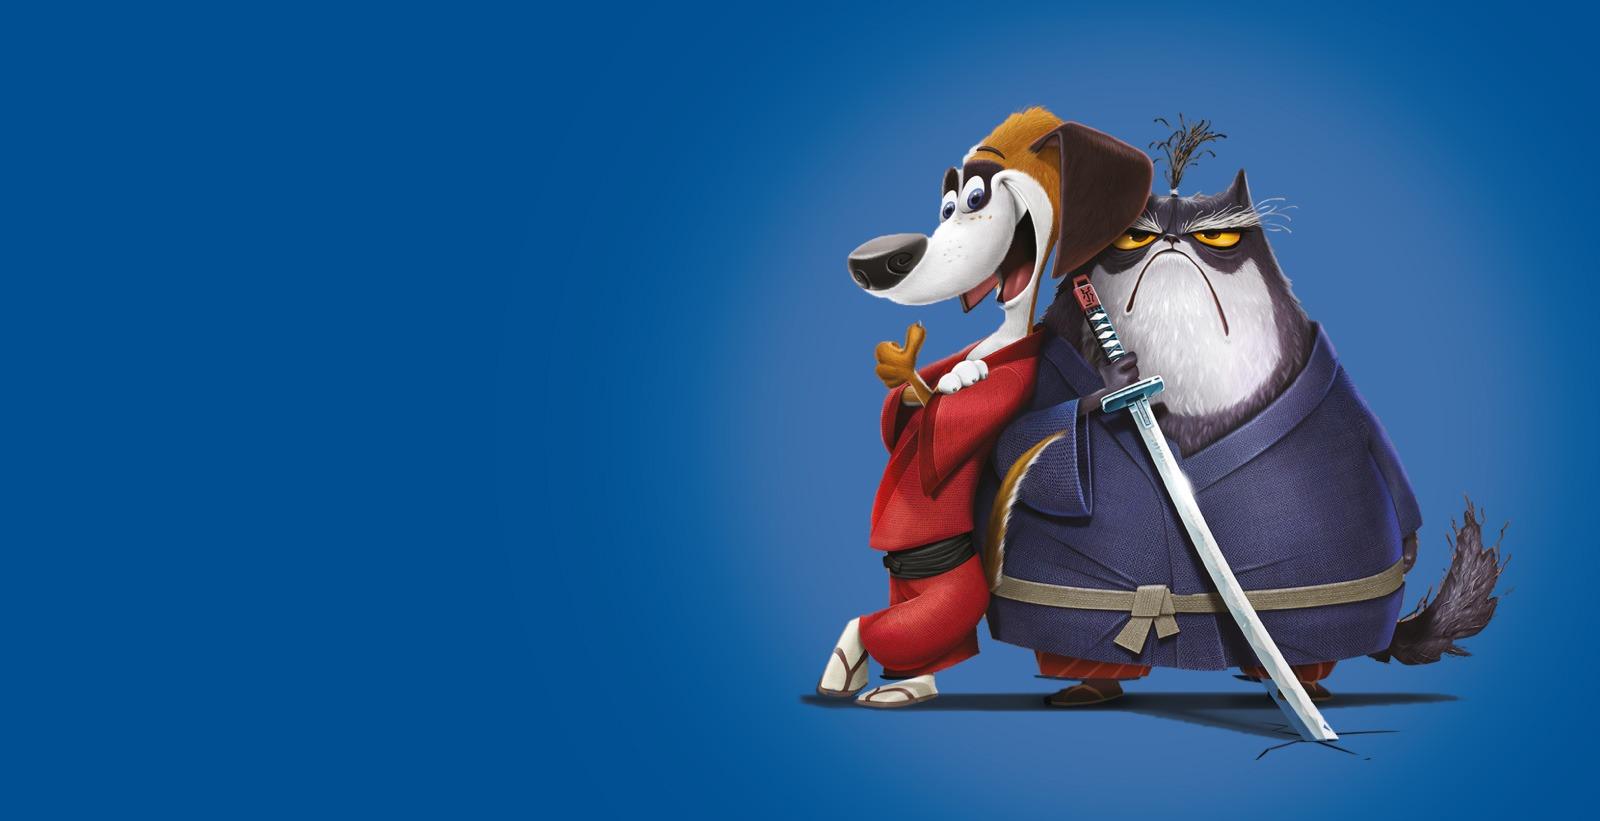 Animated feature 'Blazing Samurai' is coming to Cinesite ...